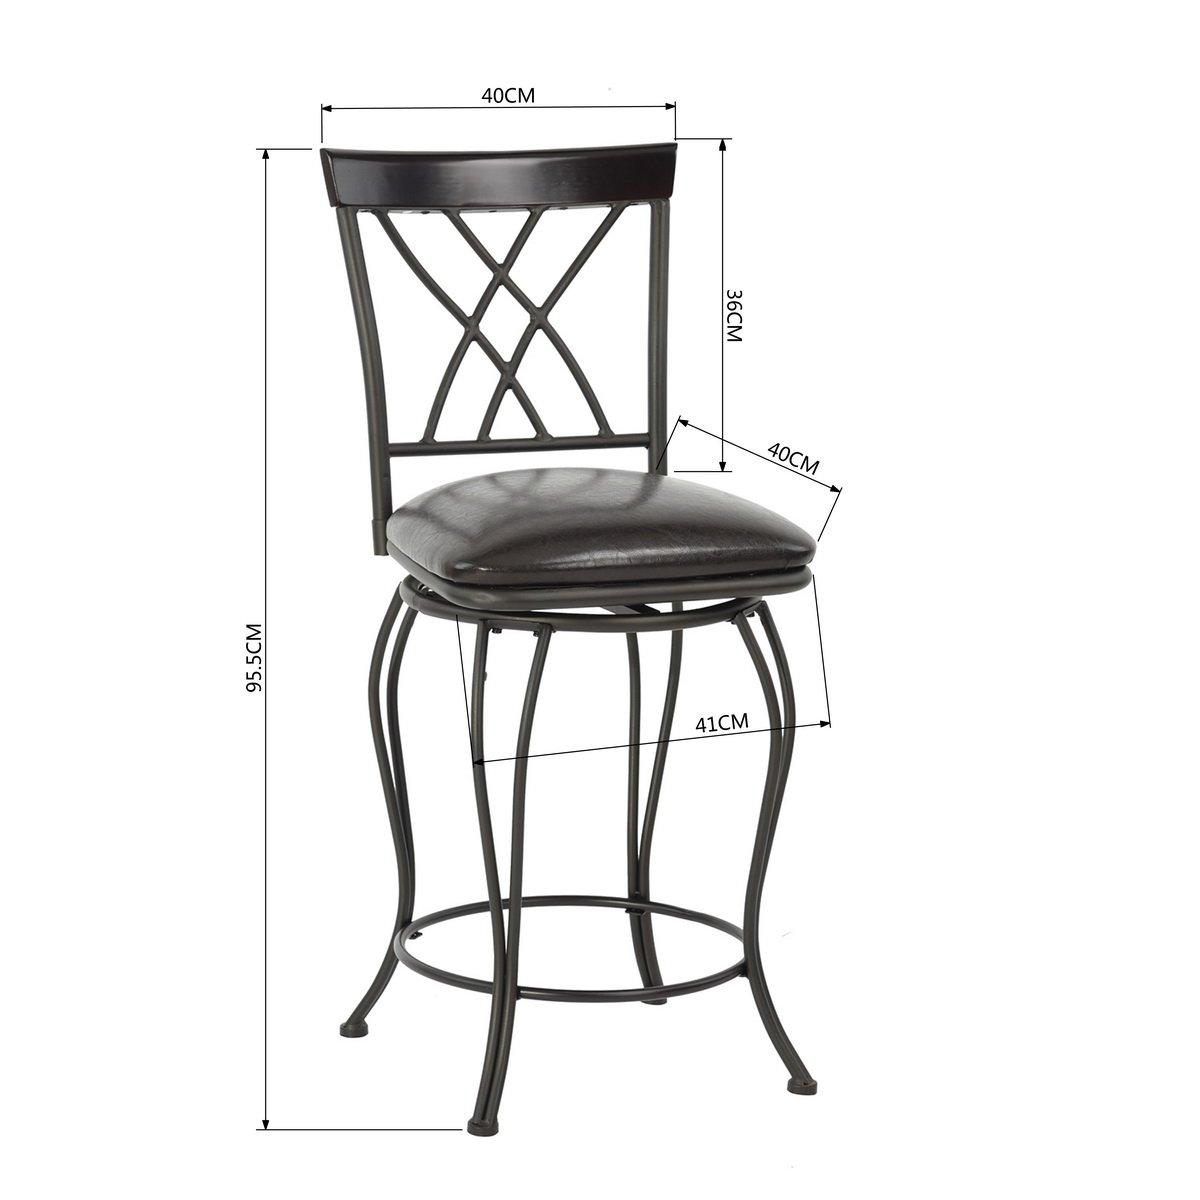 FurnitureR 24'' Circles-Back Swivel Bar stool Counter Height Bar Chair by FurnitureR (Image #8)